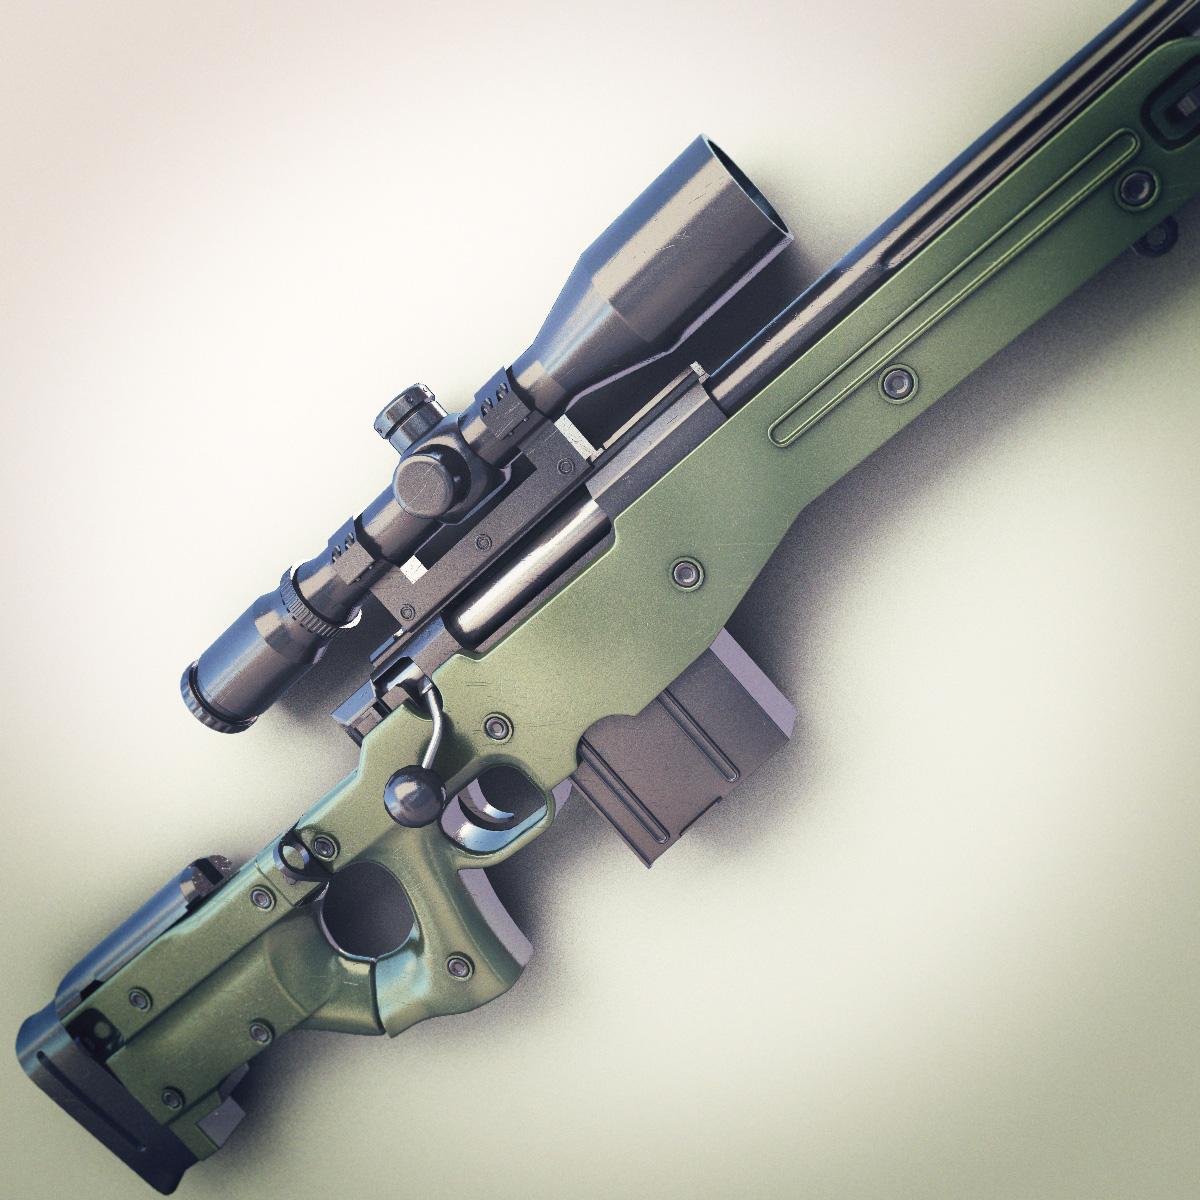 Girl In Action Wallpaper Awm Sniper Rifle Hi Res 3d Model Max Obj Fbx Lwo Lw